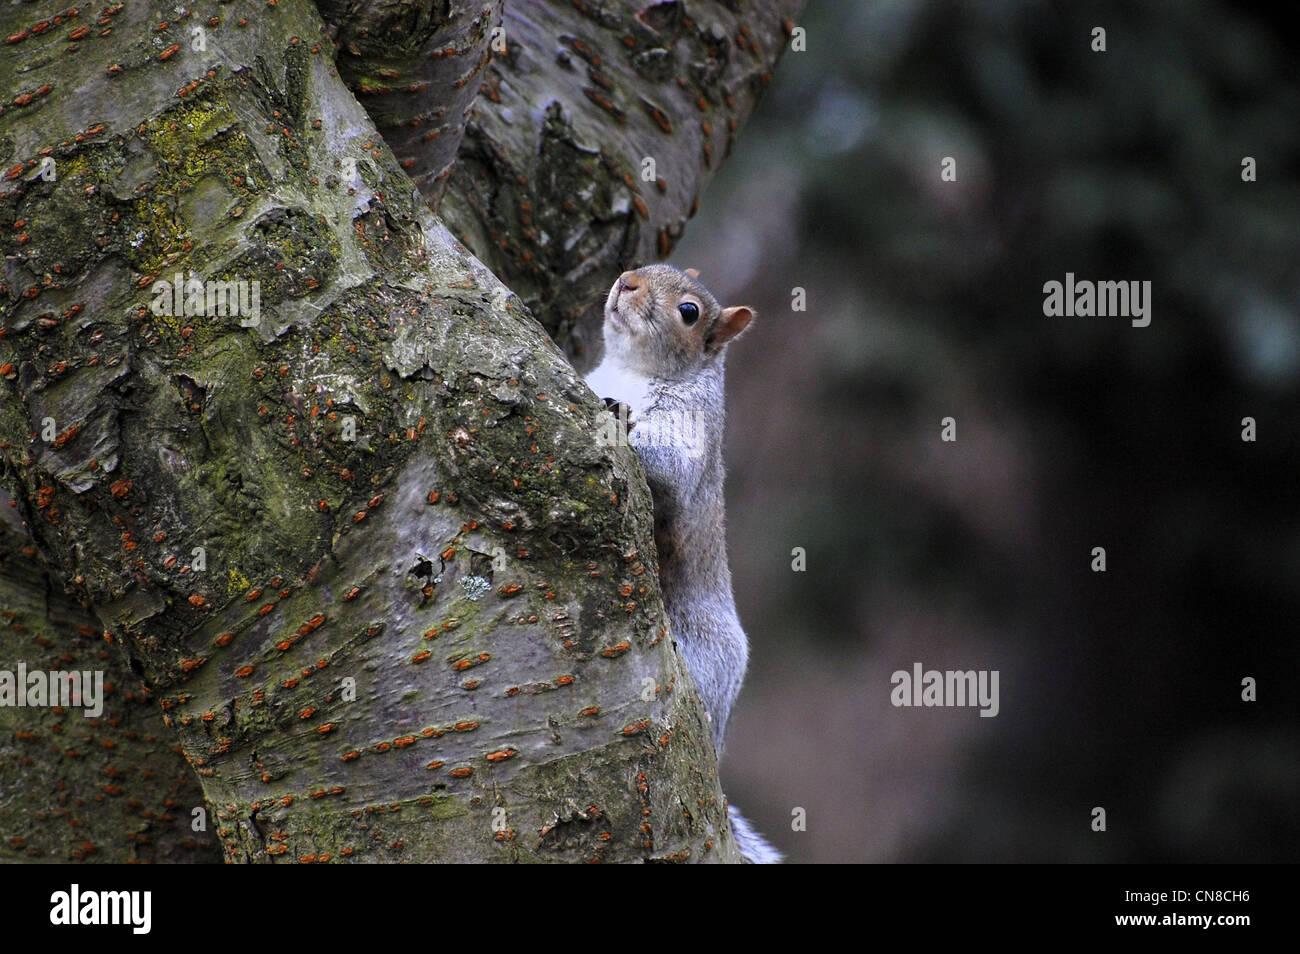 Grey squirrel, UK, paused on upward tree climb - Stock Image